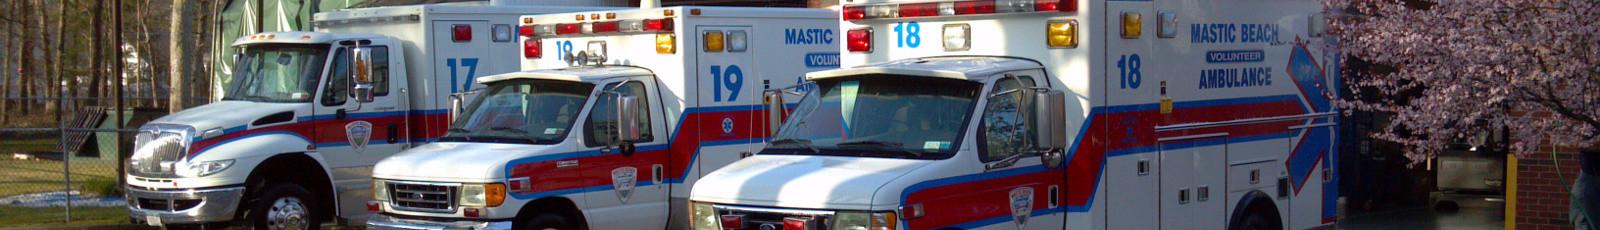 Mastic Beach Ambulance Company